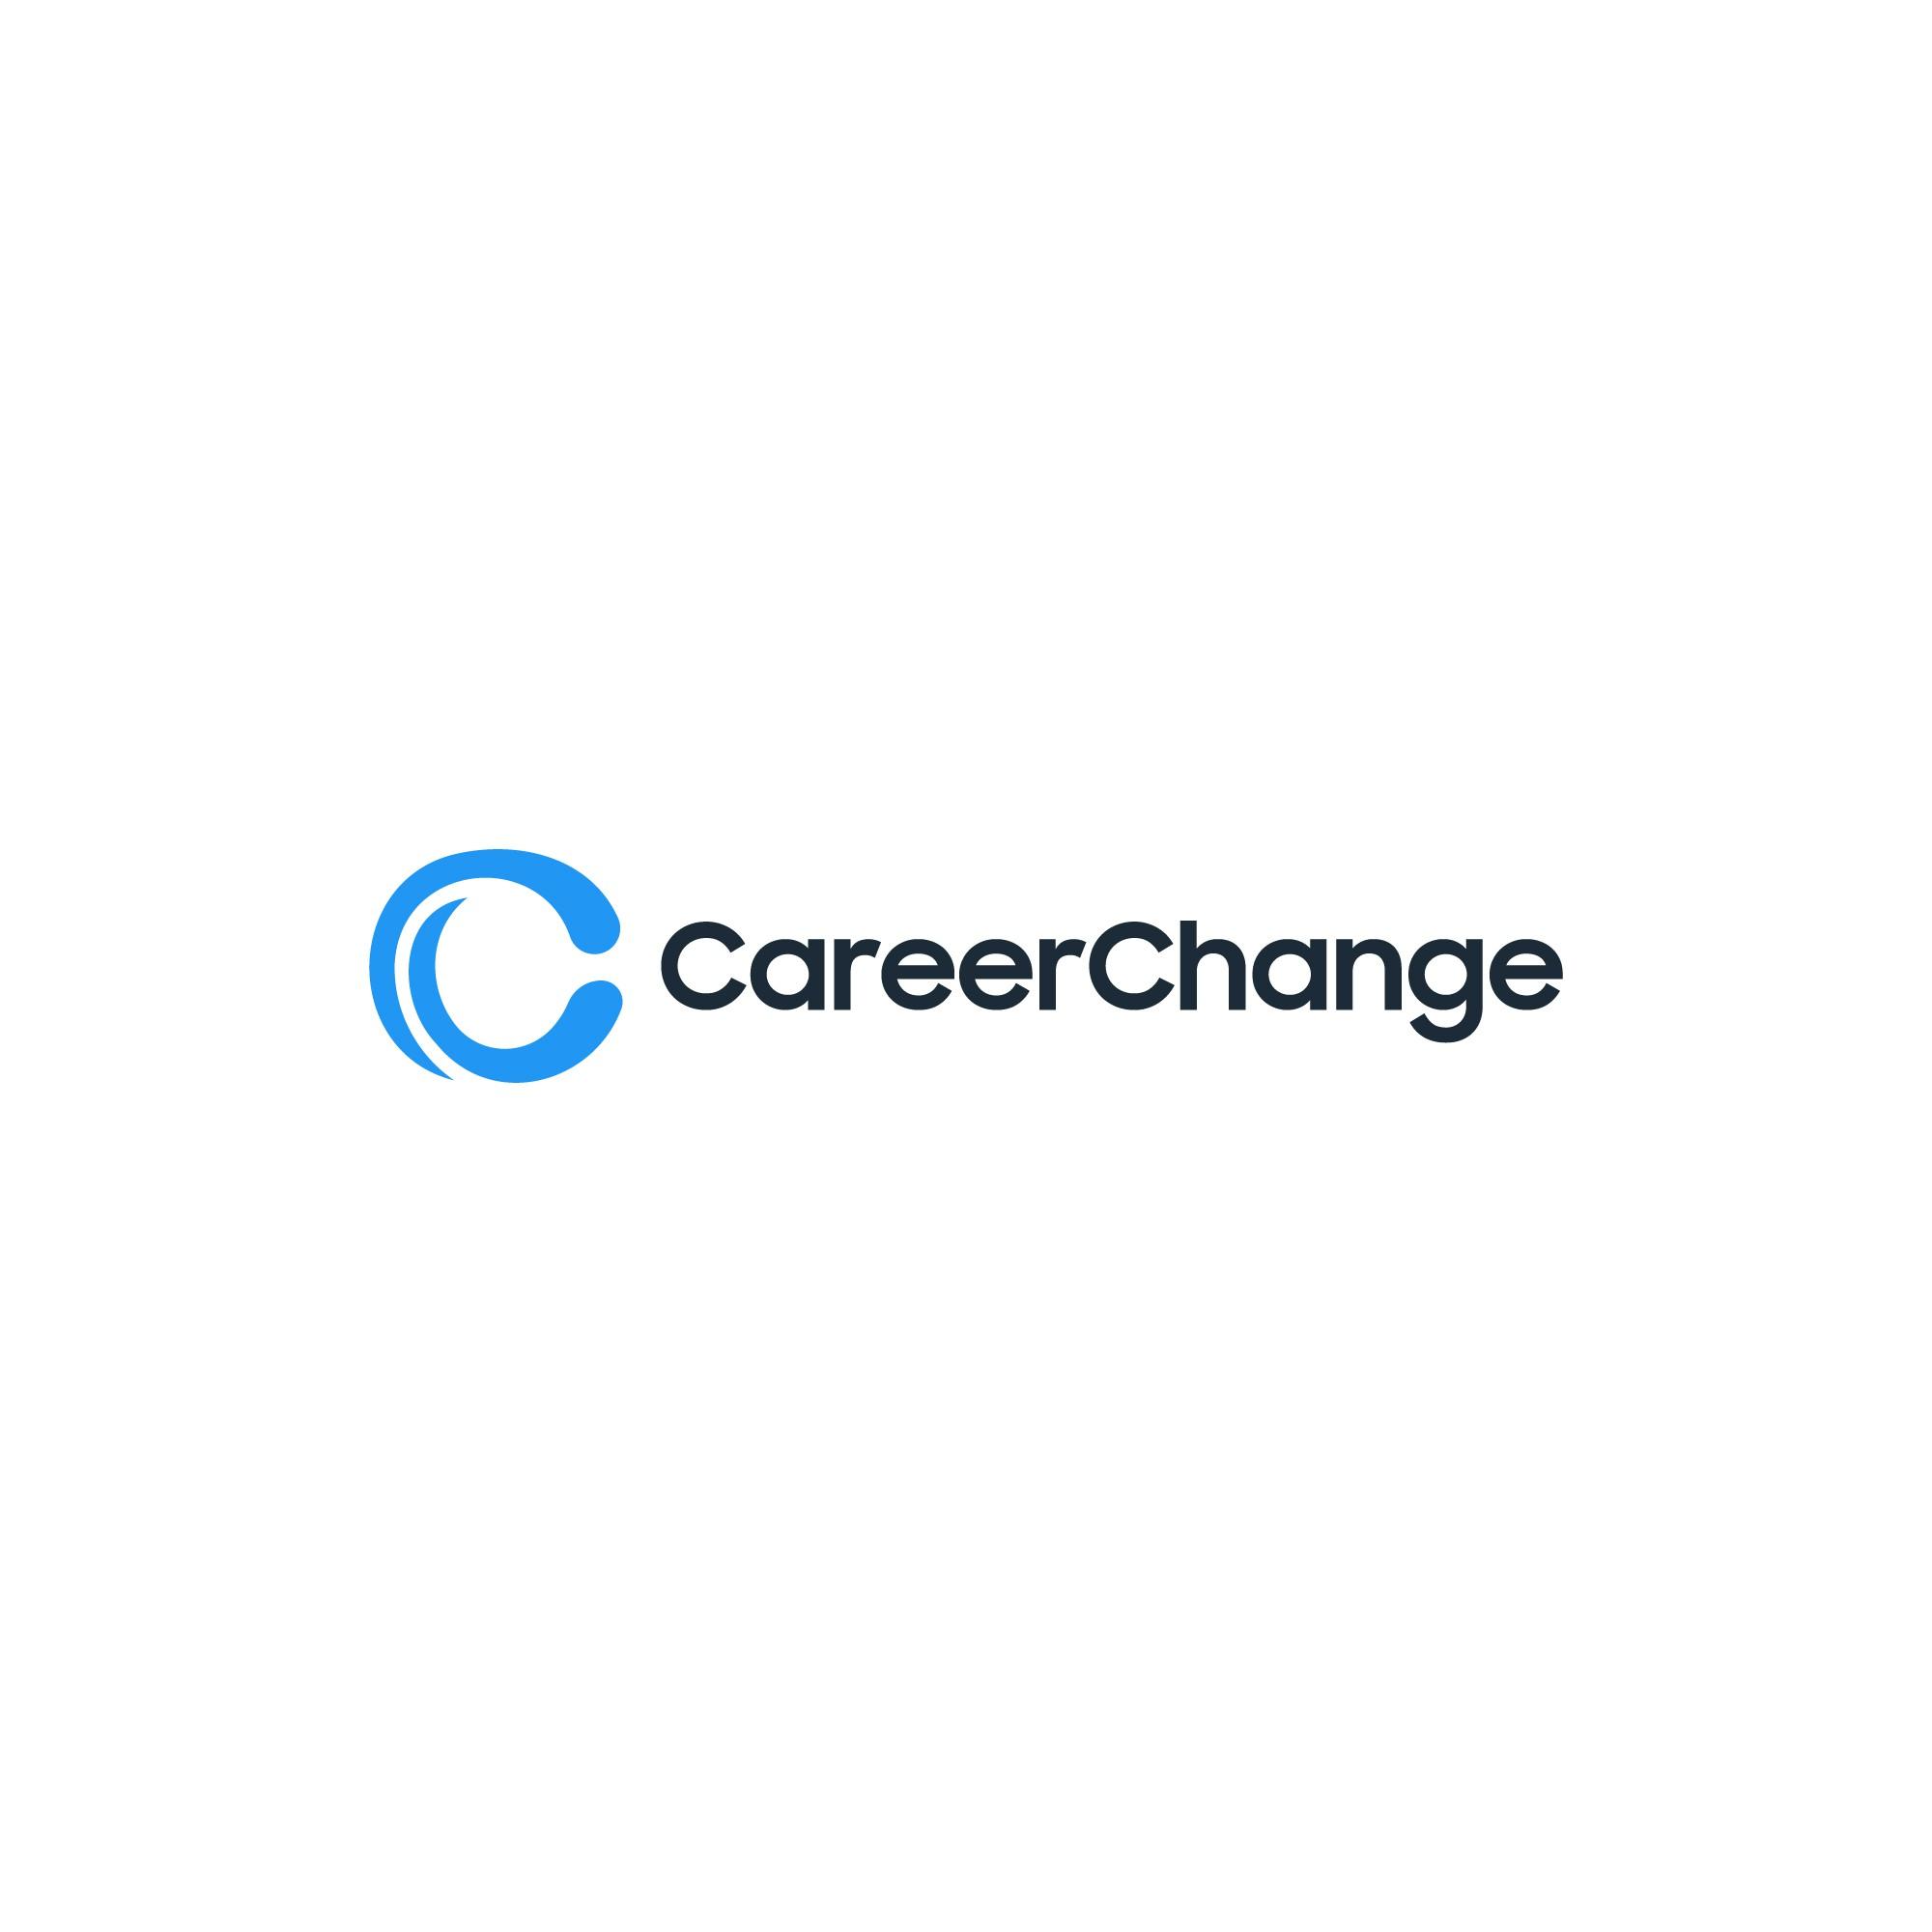 Seeking wordmark logo design for Career Change website